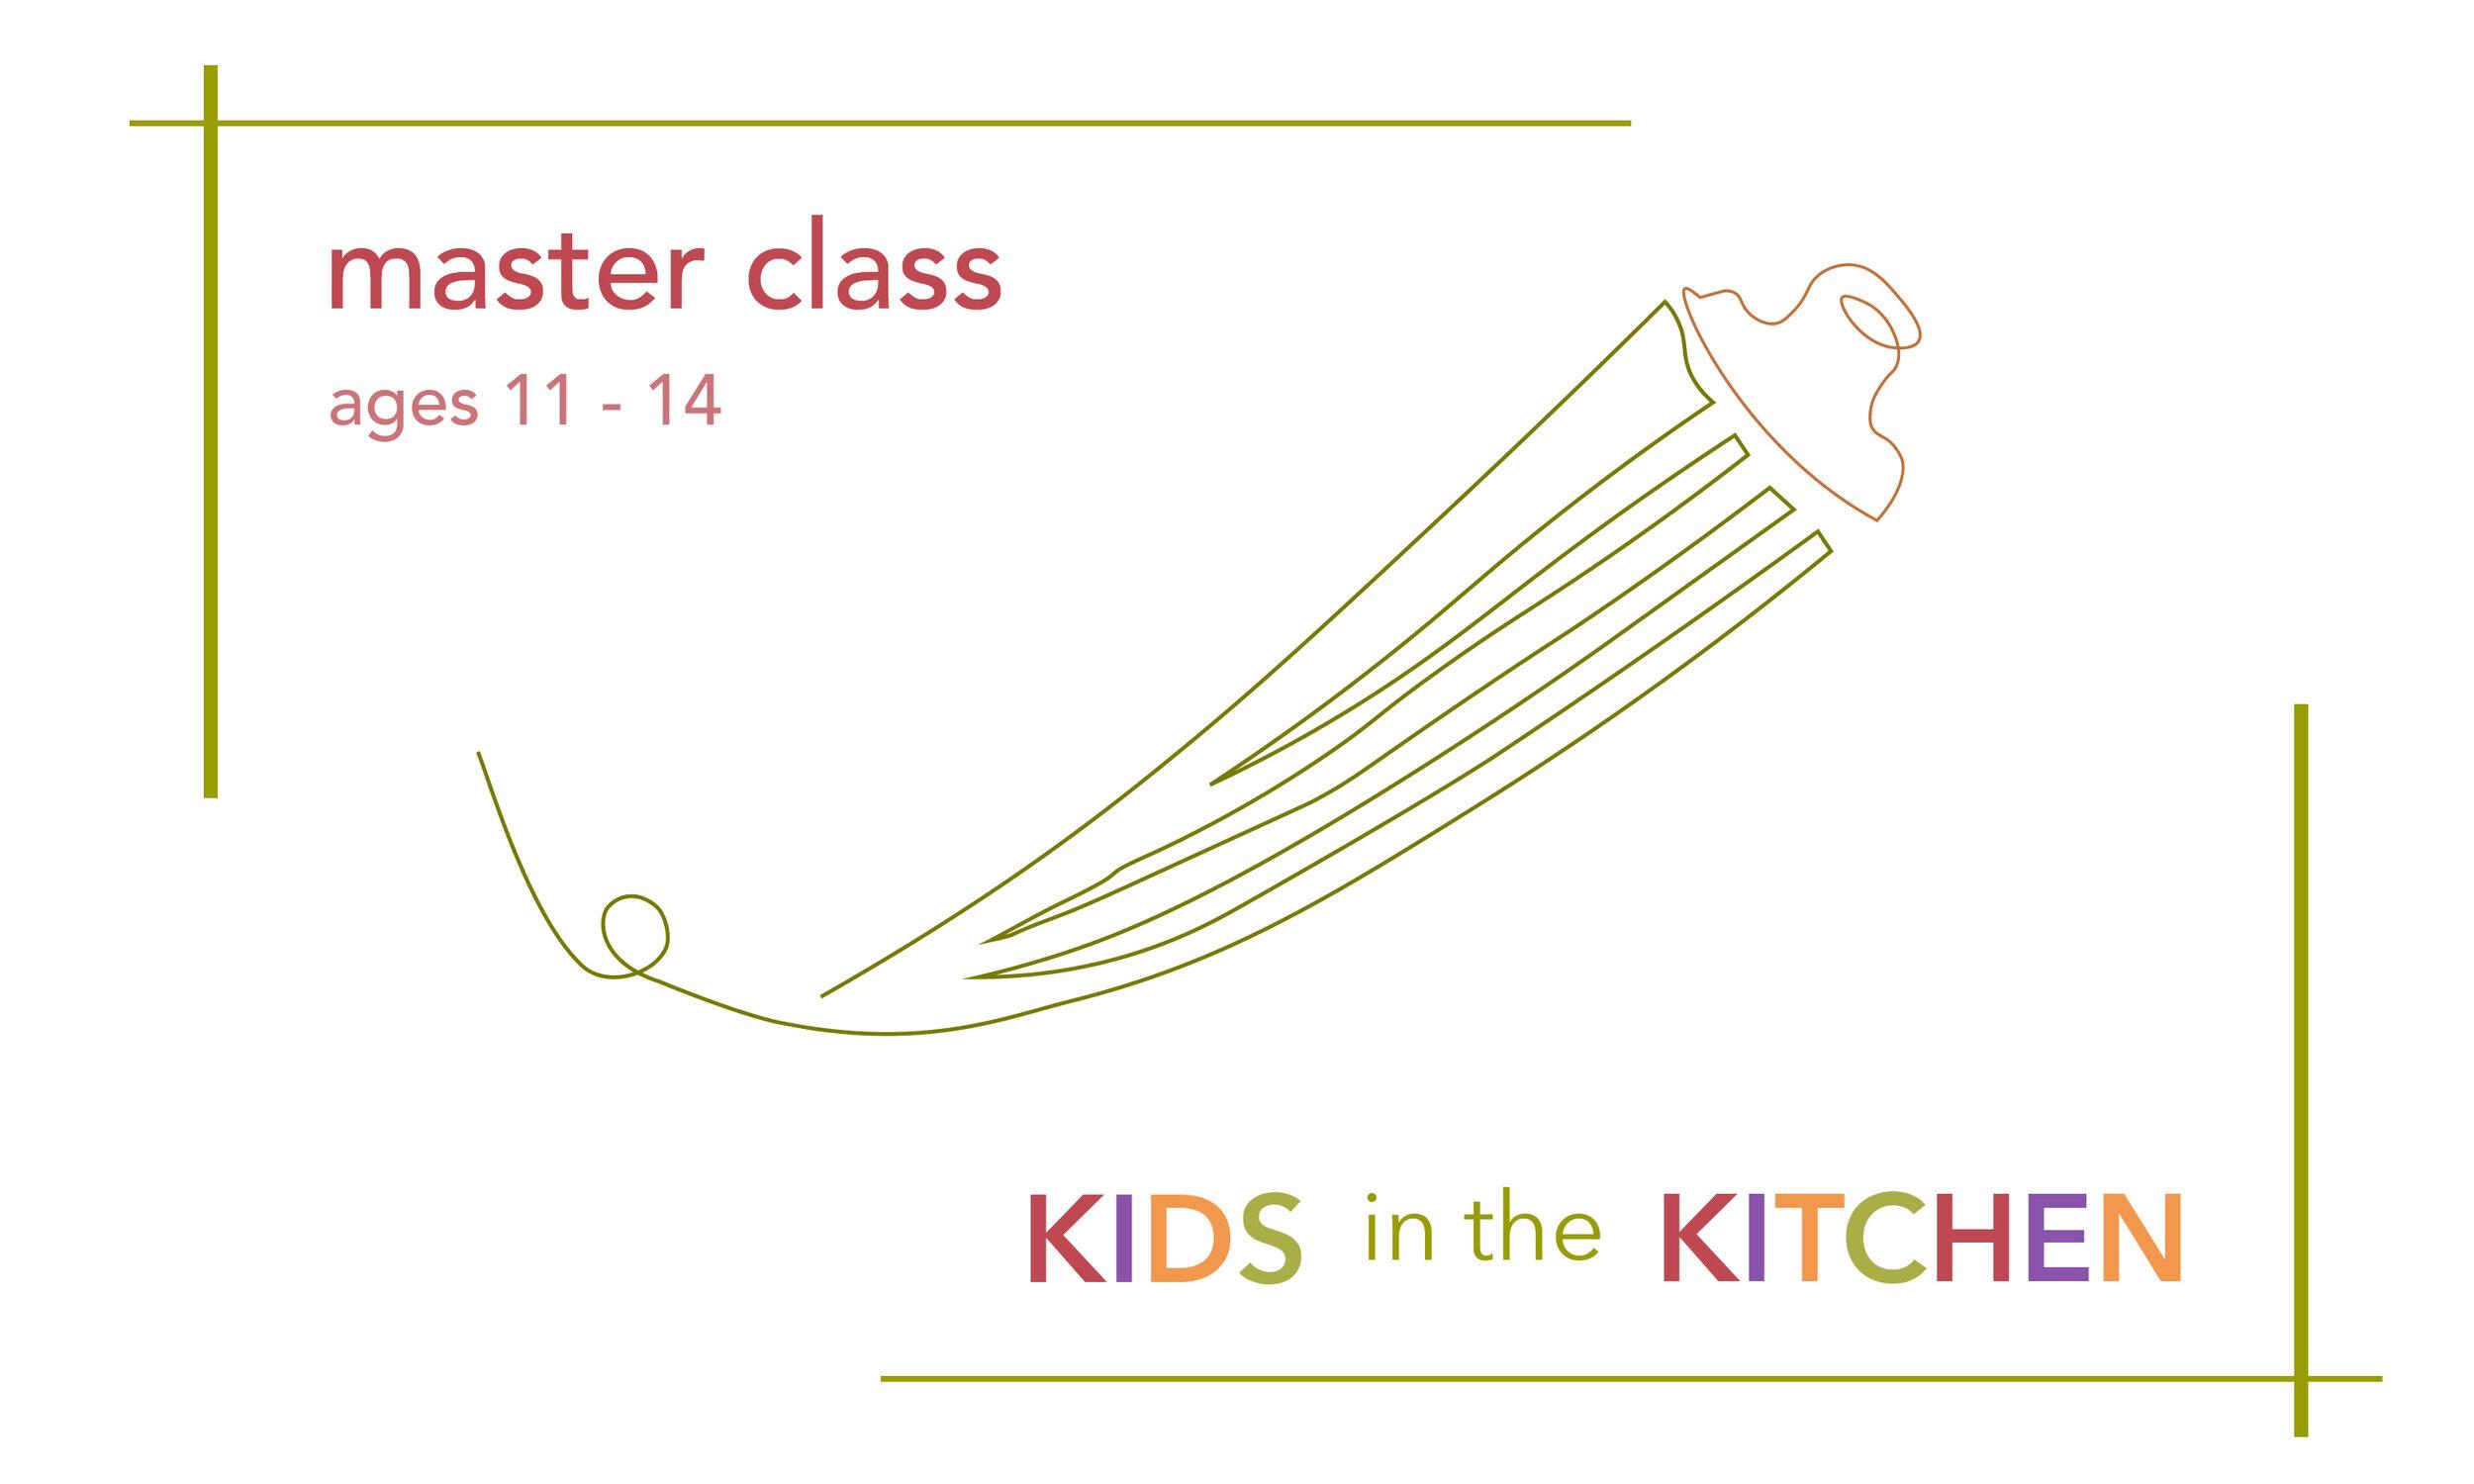 kids in the kitchen (master class).jpg